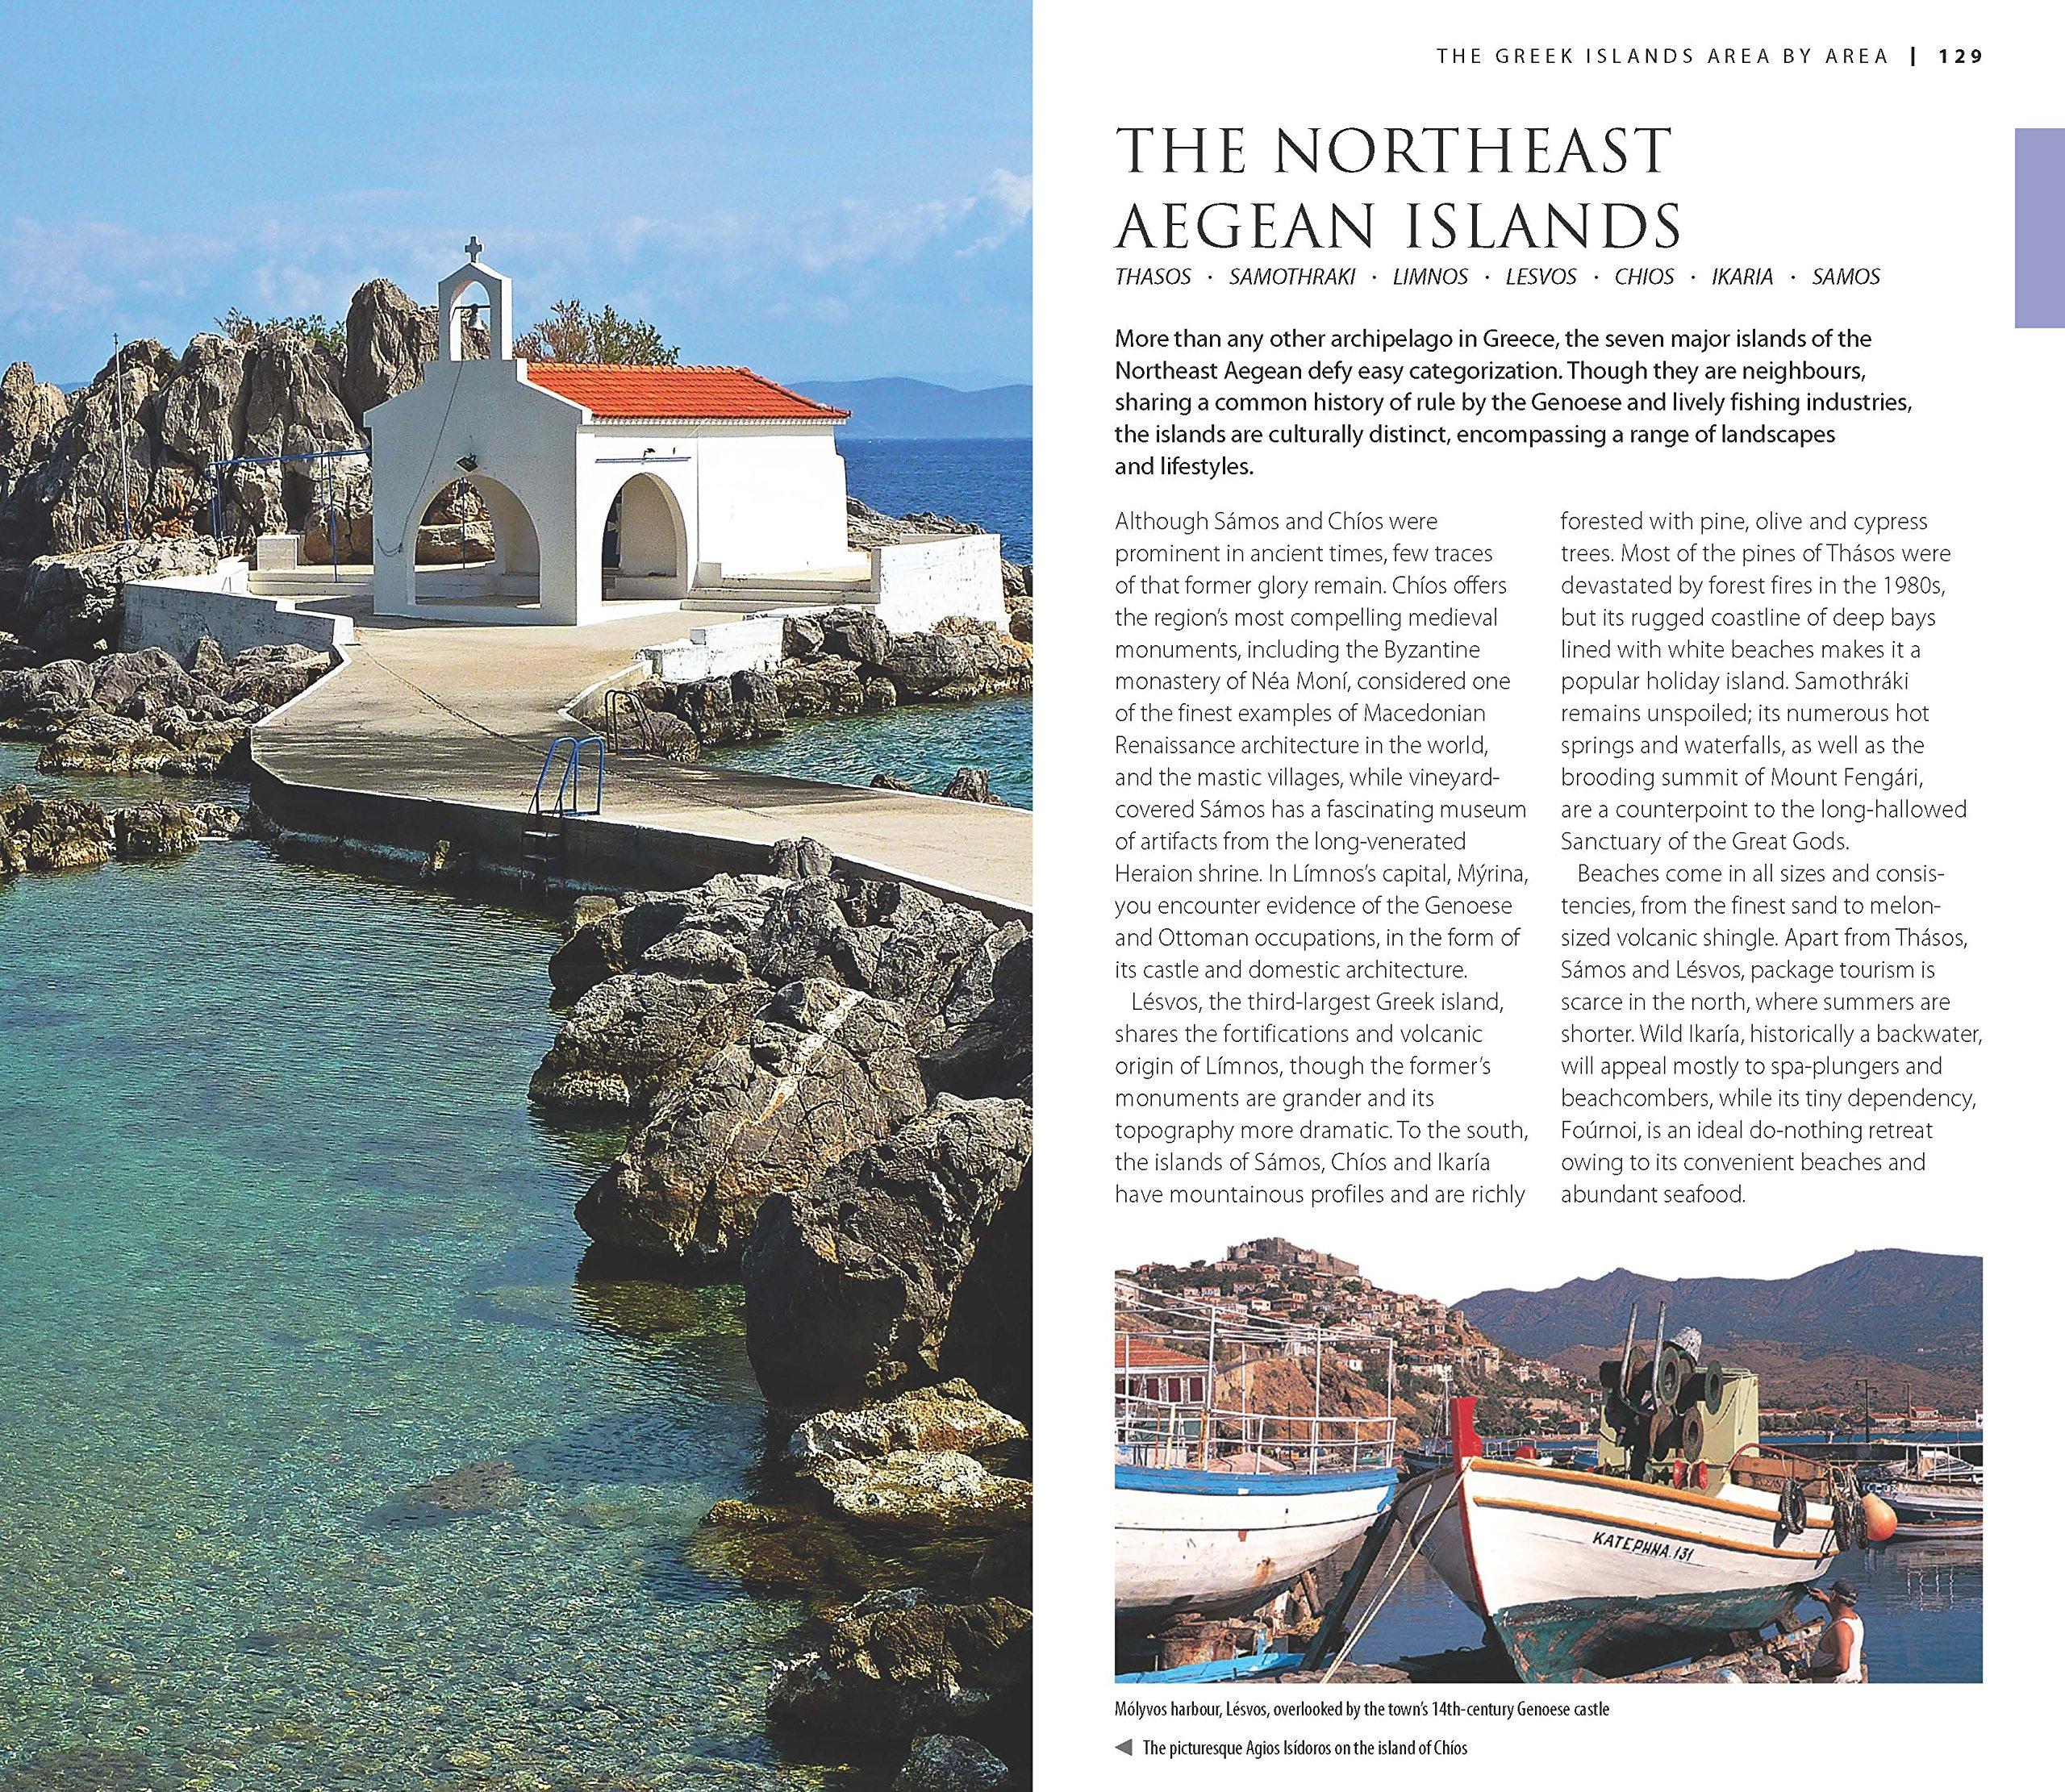 DK Eyewitness Travel Guide  The Greek Islands  DK Travel  9781465428219   Amazon.com  Books de258b1ba8b